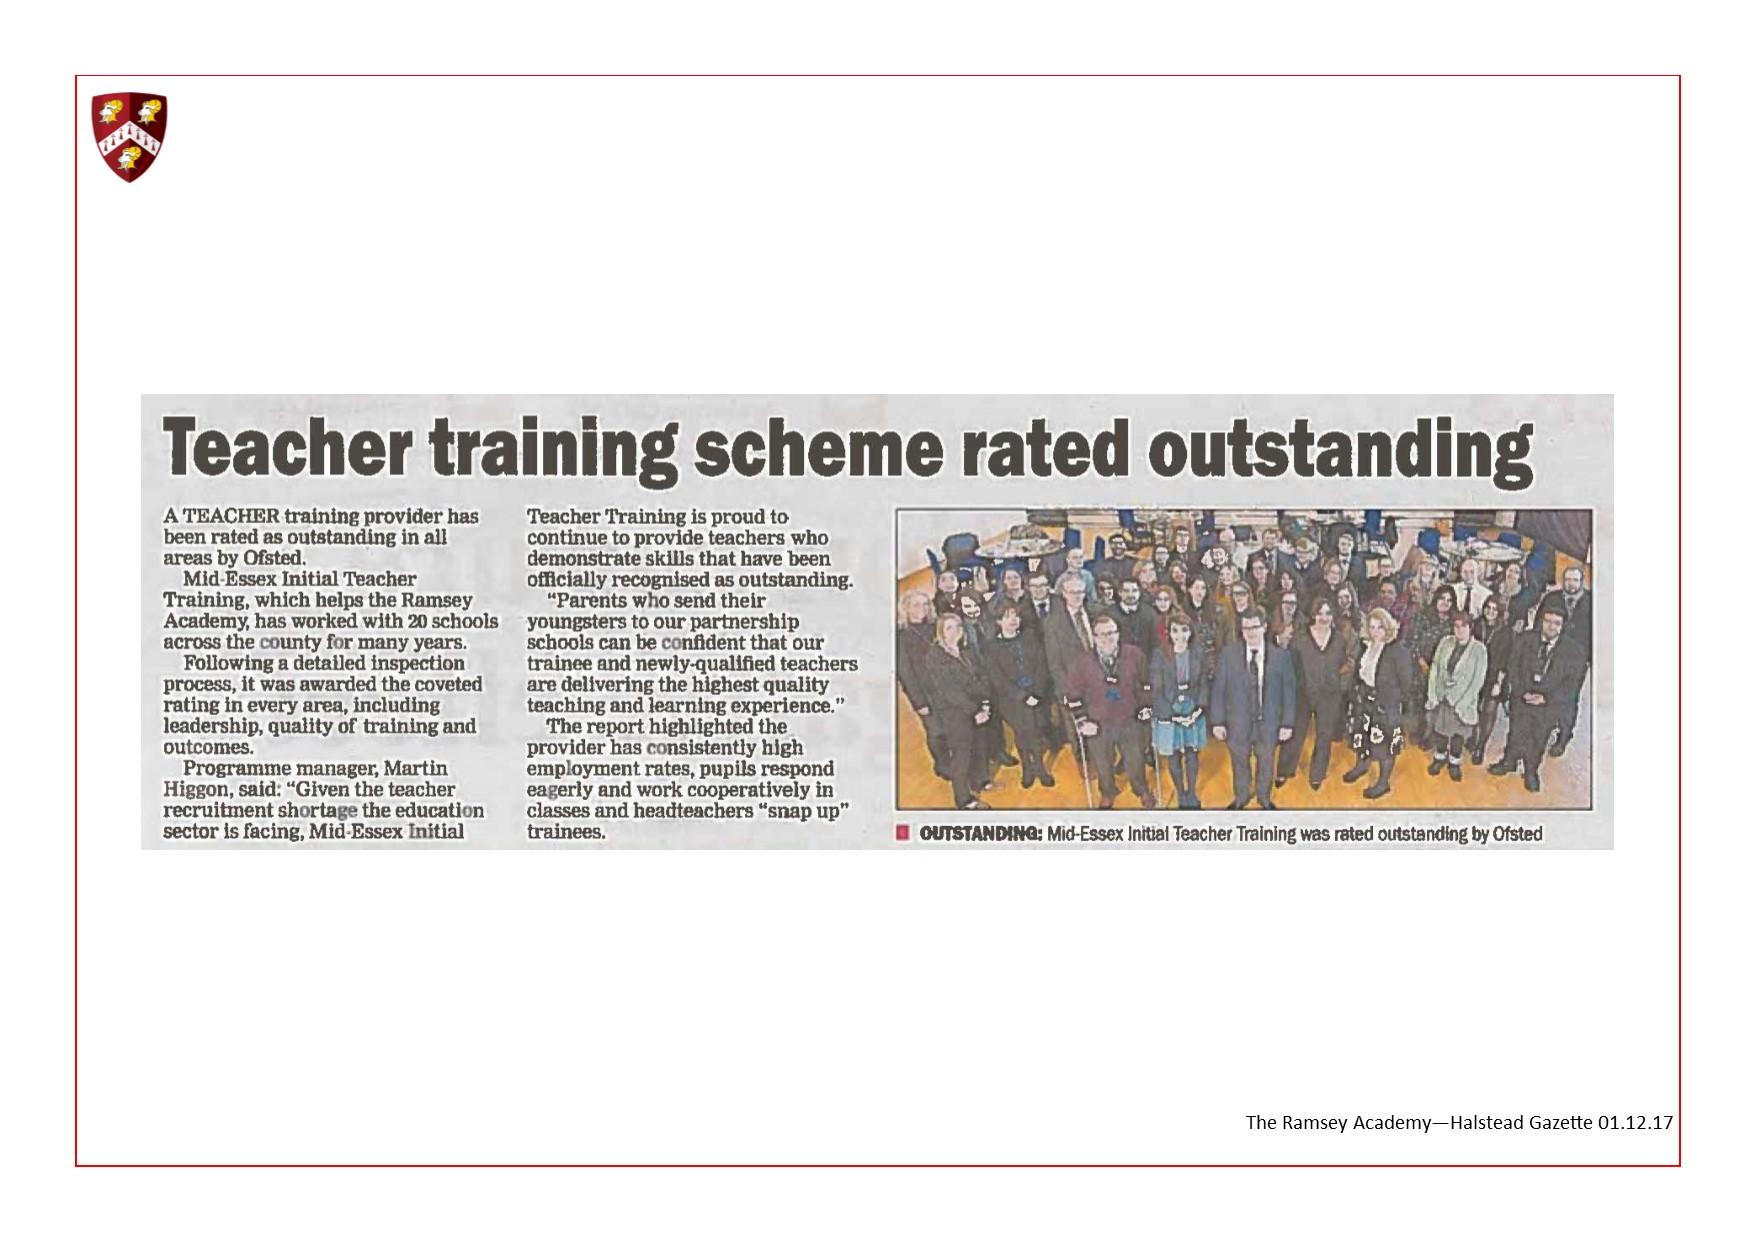 Teacher Training Scheme Rated Outstanding 01.12.17